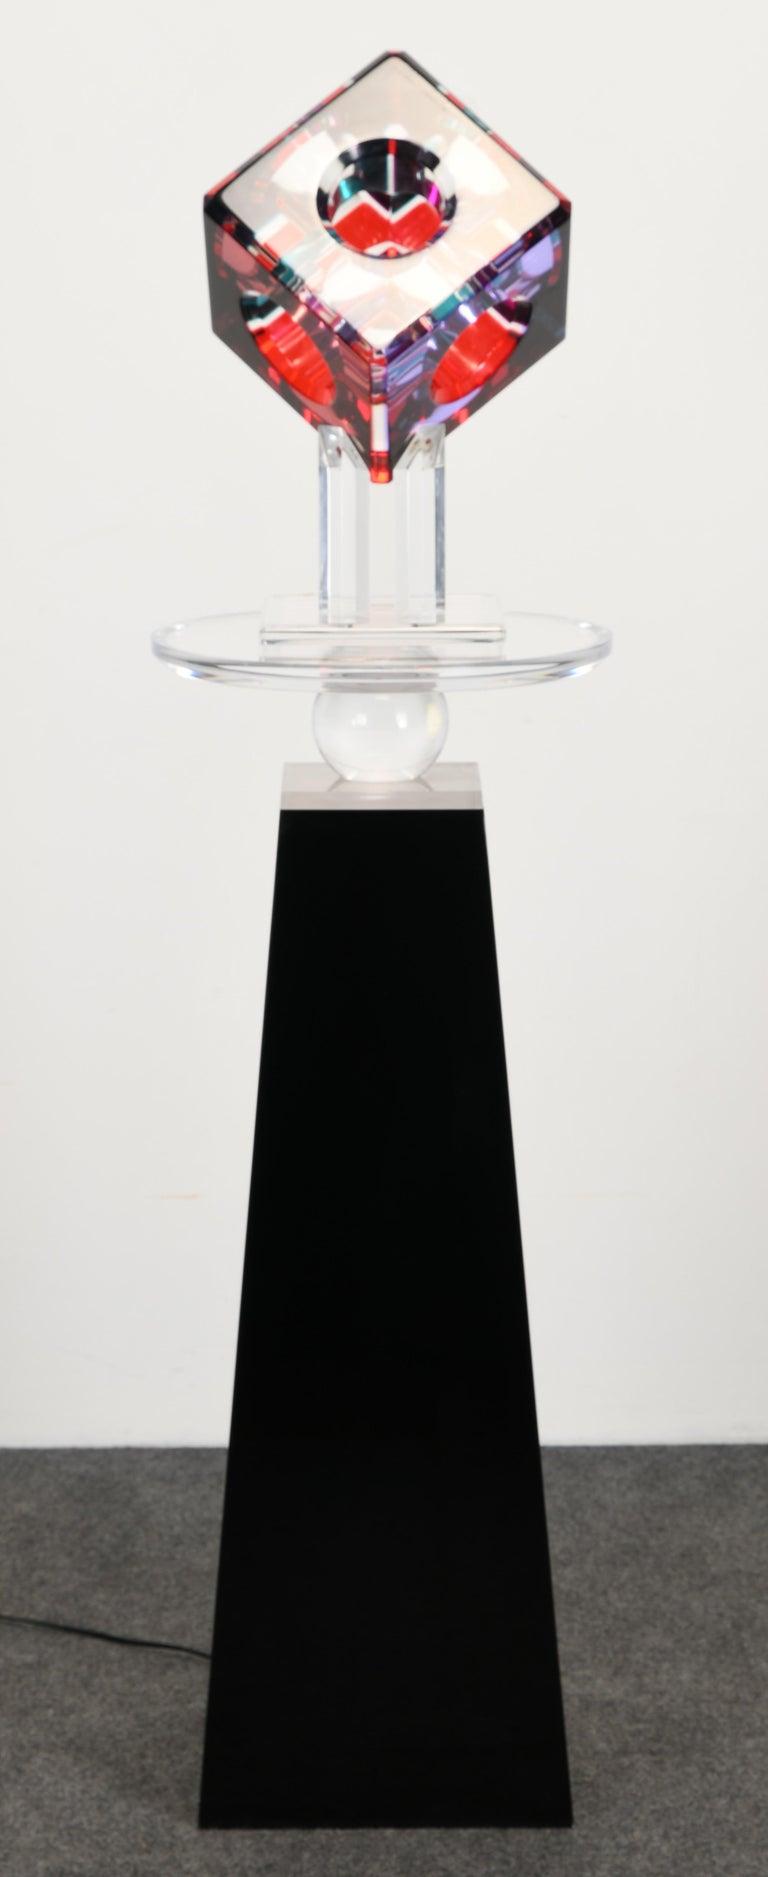 American Lucite Sculpture by Shlomi Haziza, 2000s